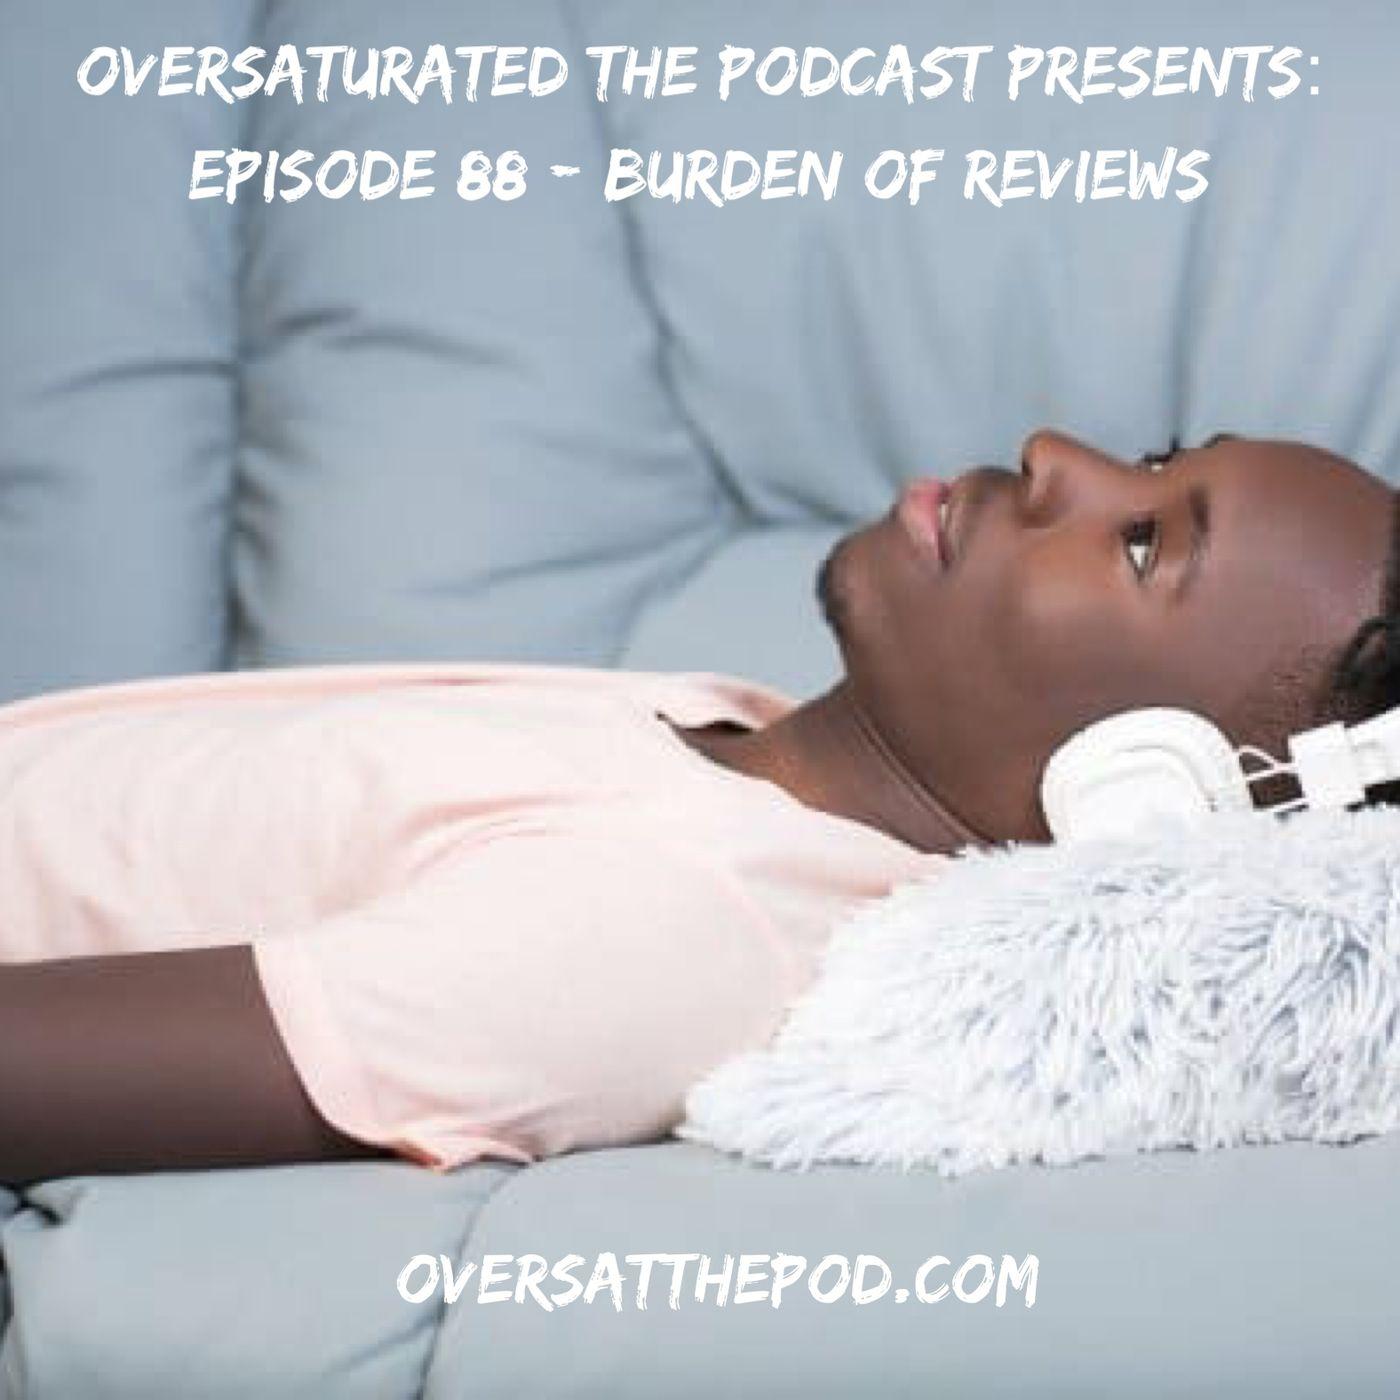 Episode 88 - Burden of Reviews